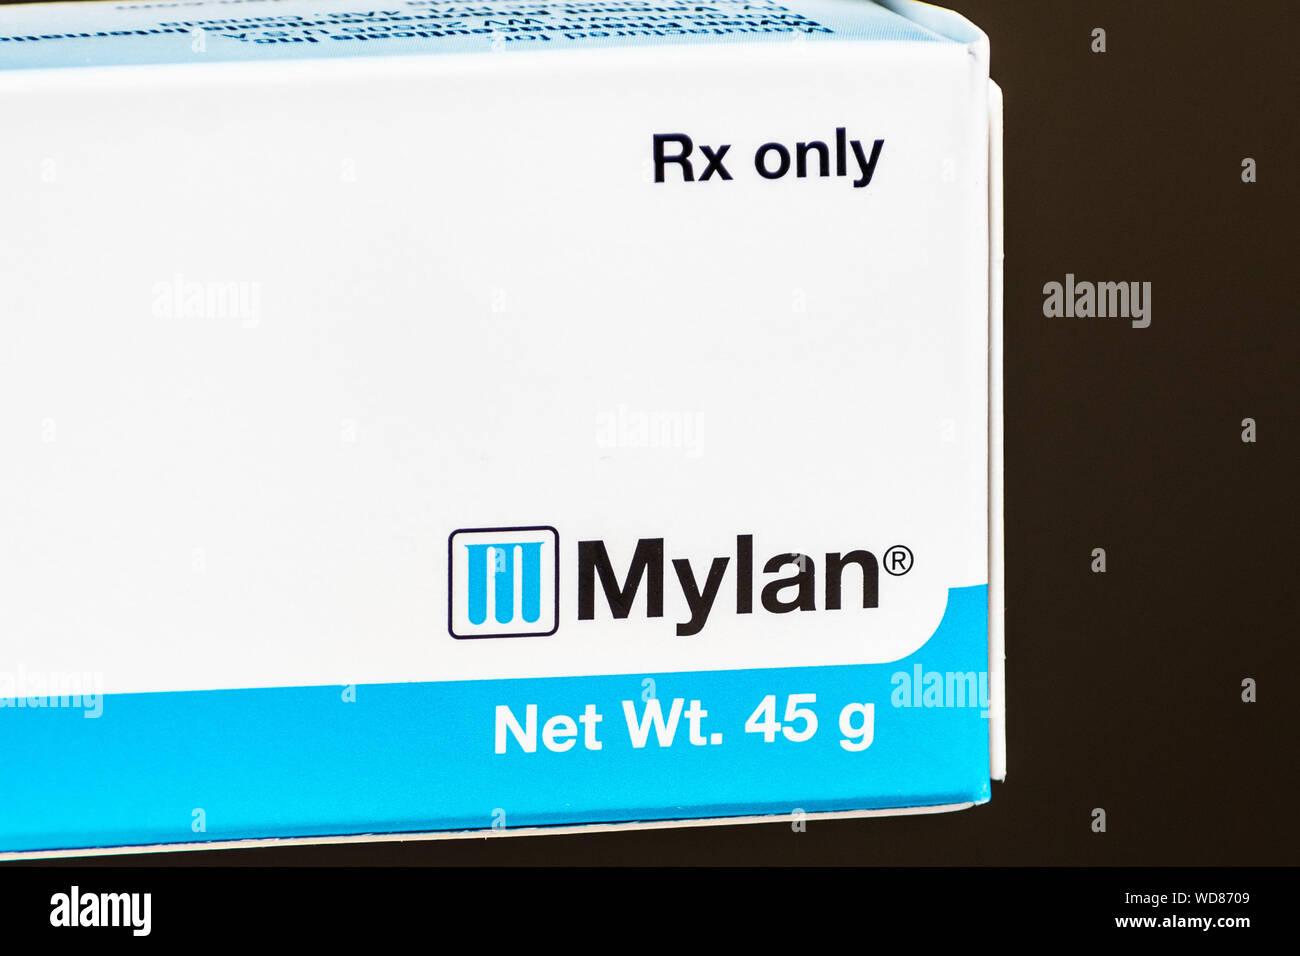 Mylan Stock Photos & Mylan Stock Images - Alamy